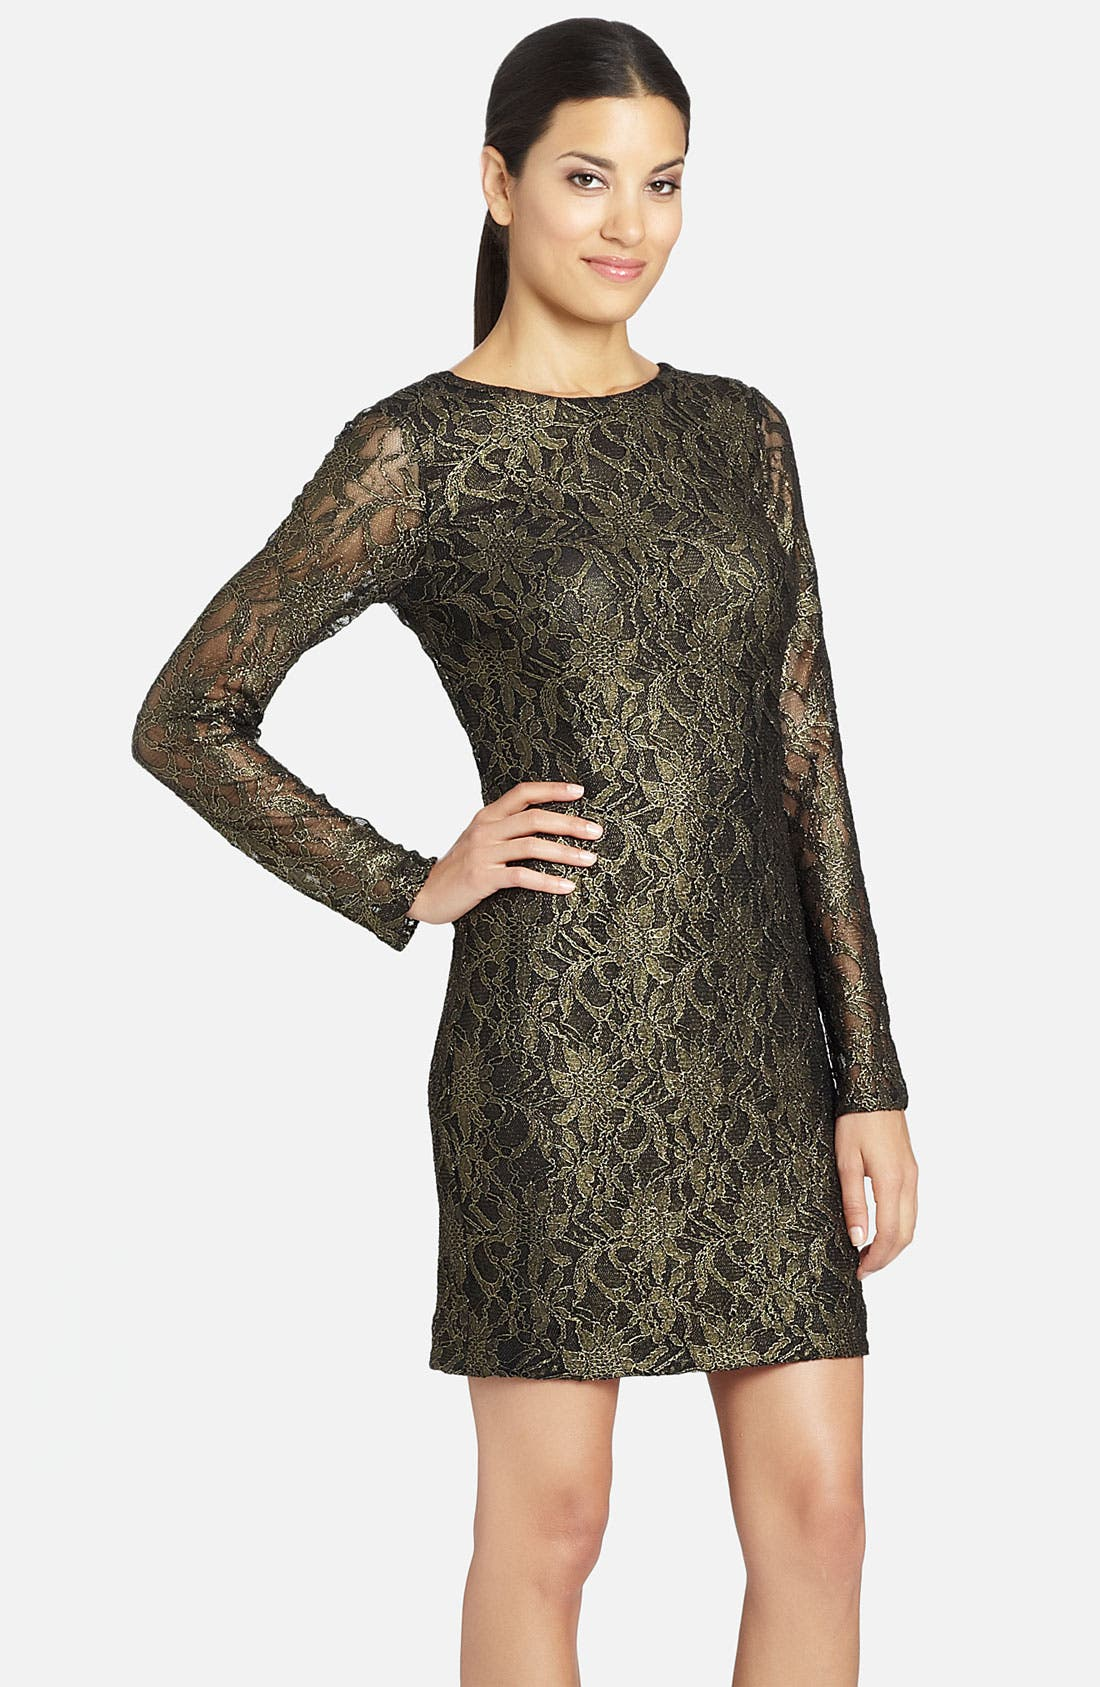 Main Image - Cynthia Steffe 'Lydia' Metallic Illusion Sleeve Lace Dress